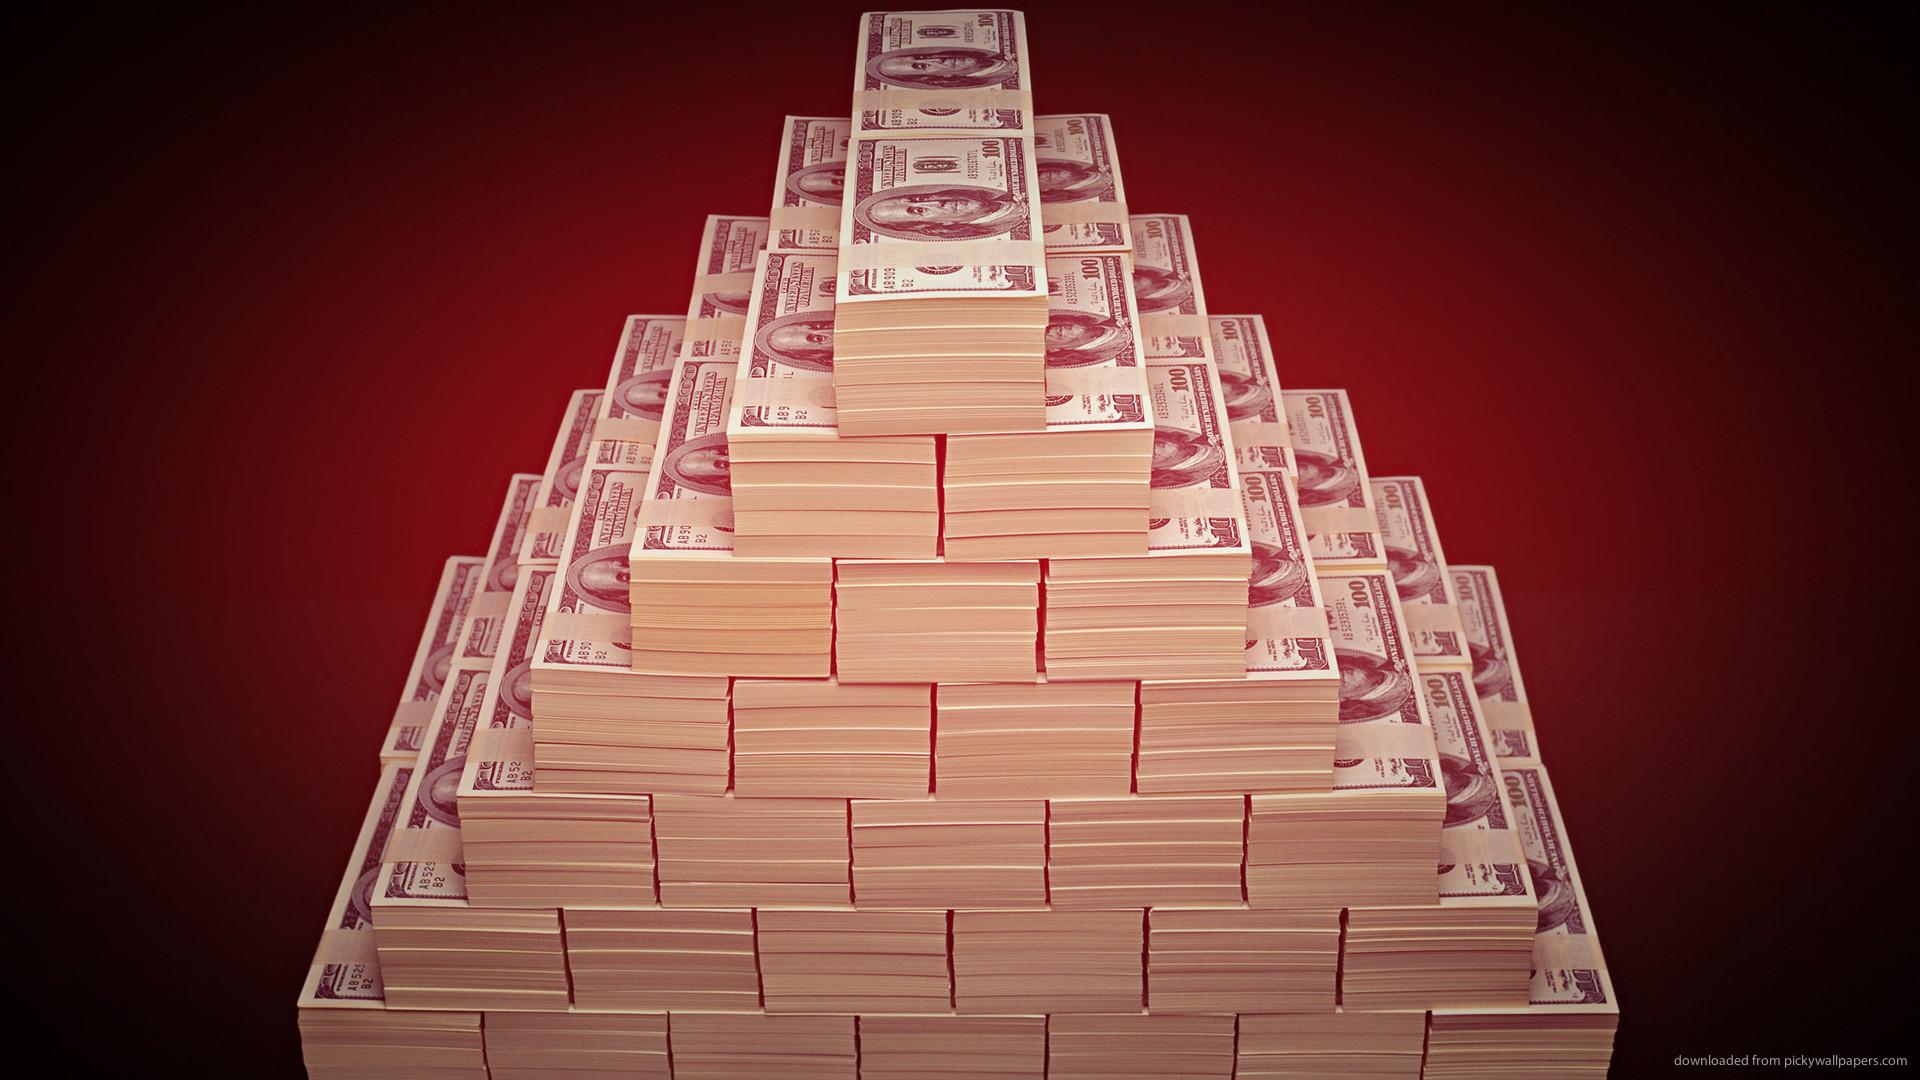 money wallpaper pan - photo #21